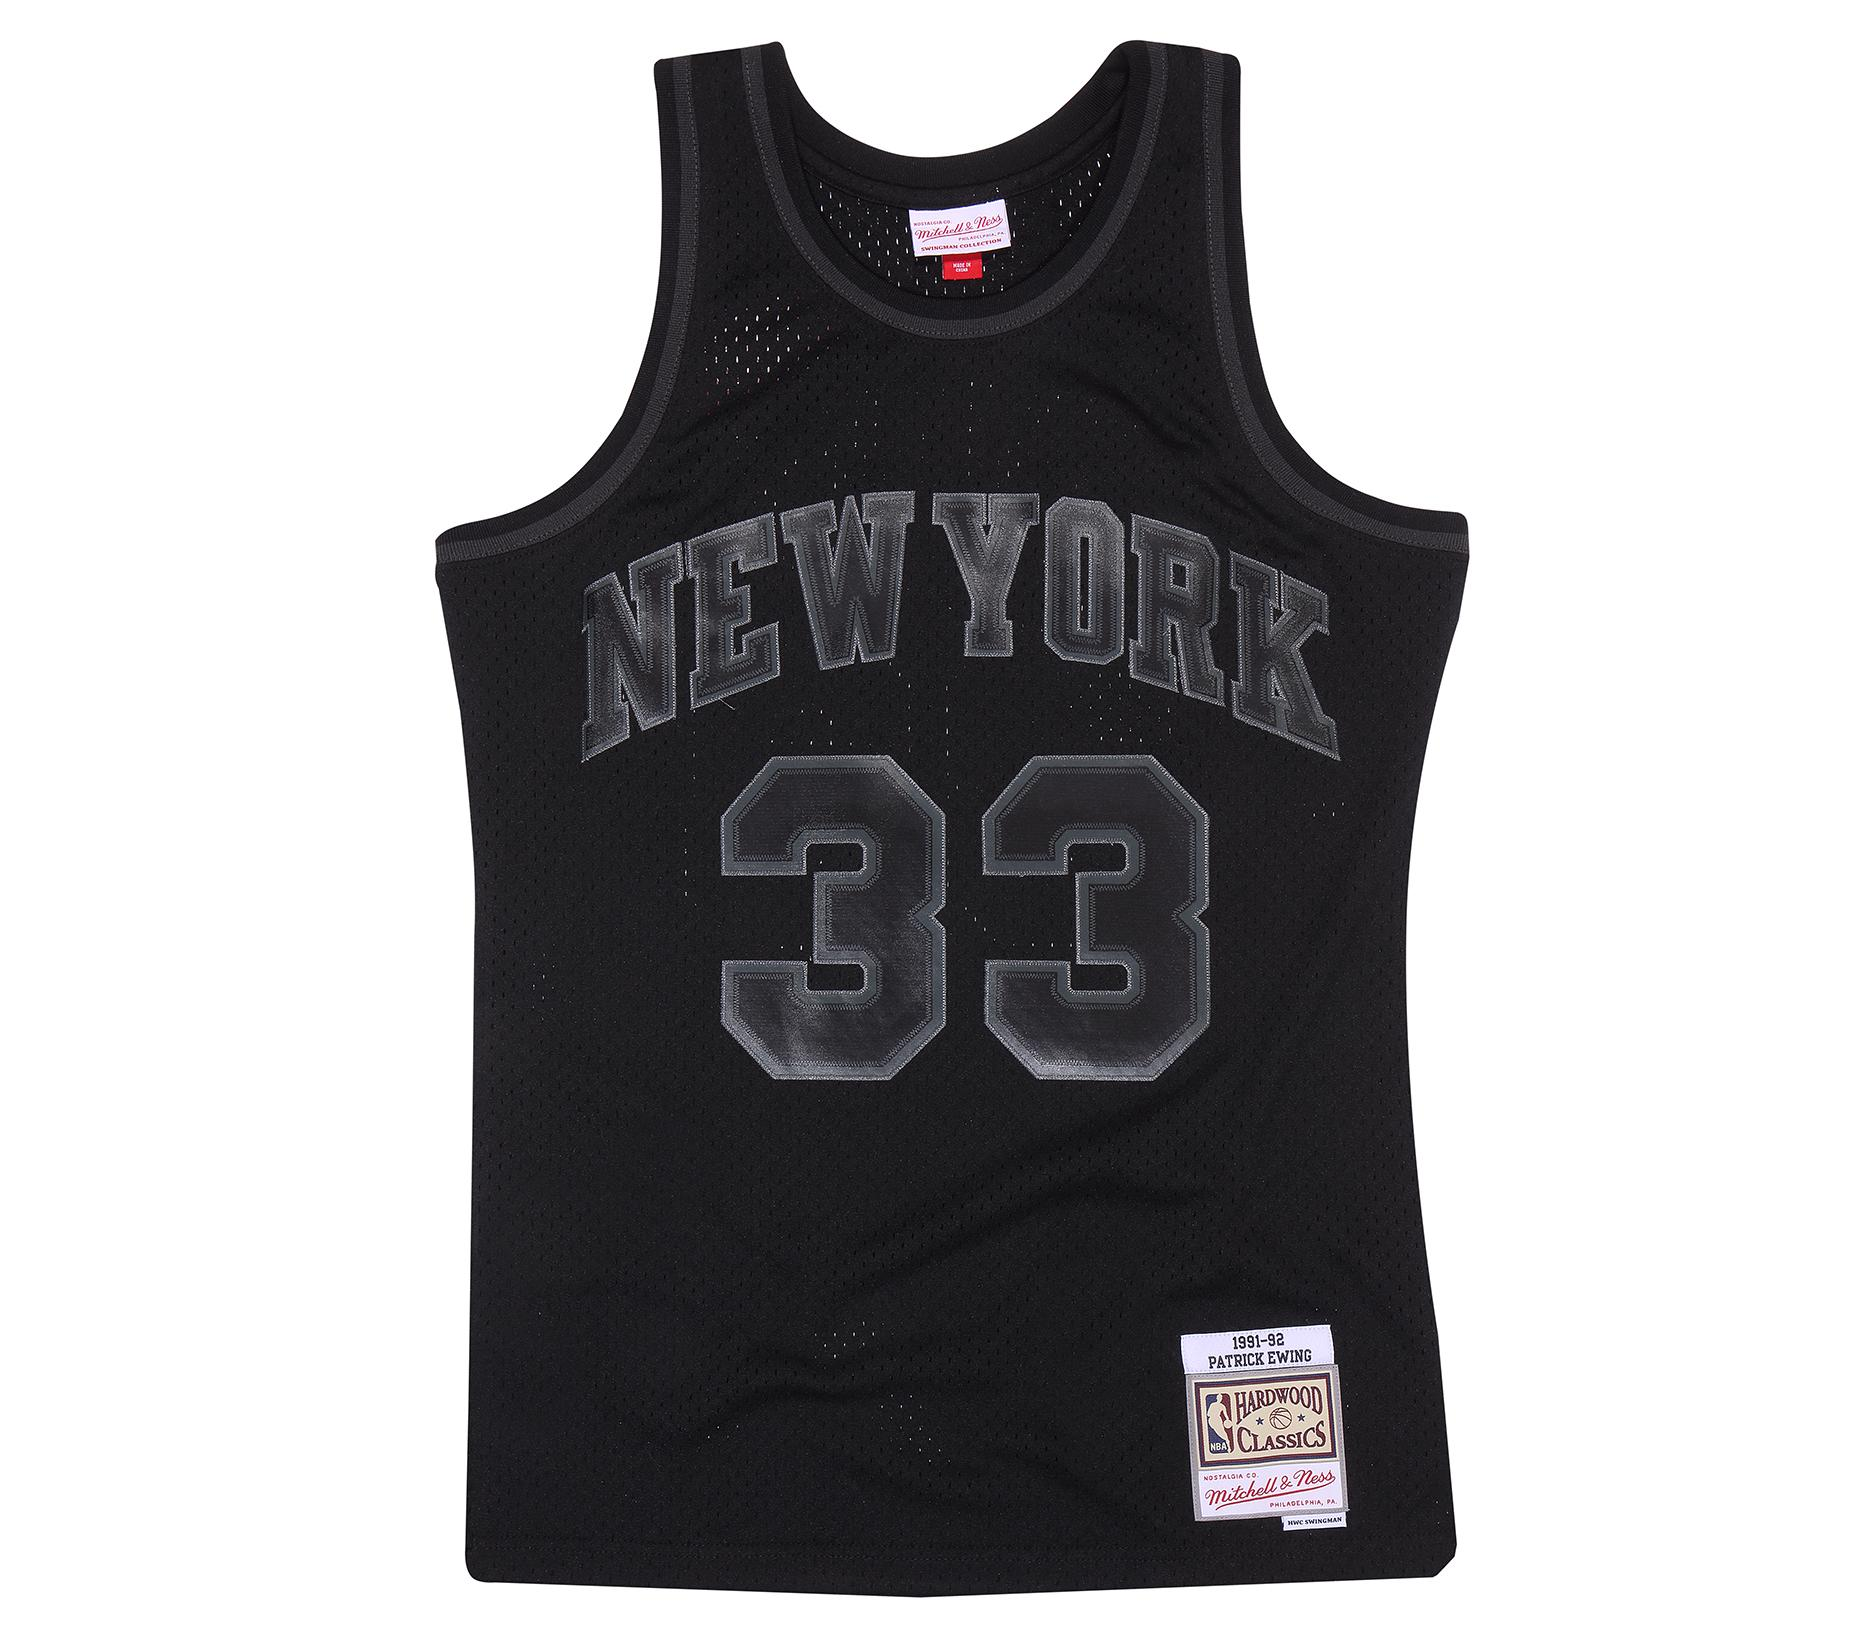 online store 546d3 9d98b Mitchell & Ness | New York Knicks Patrick Ewing Black to ...